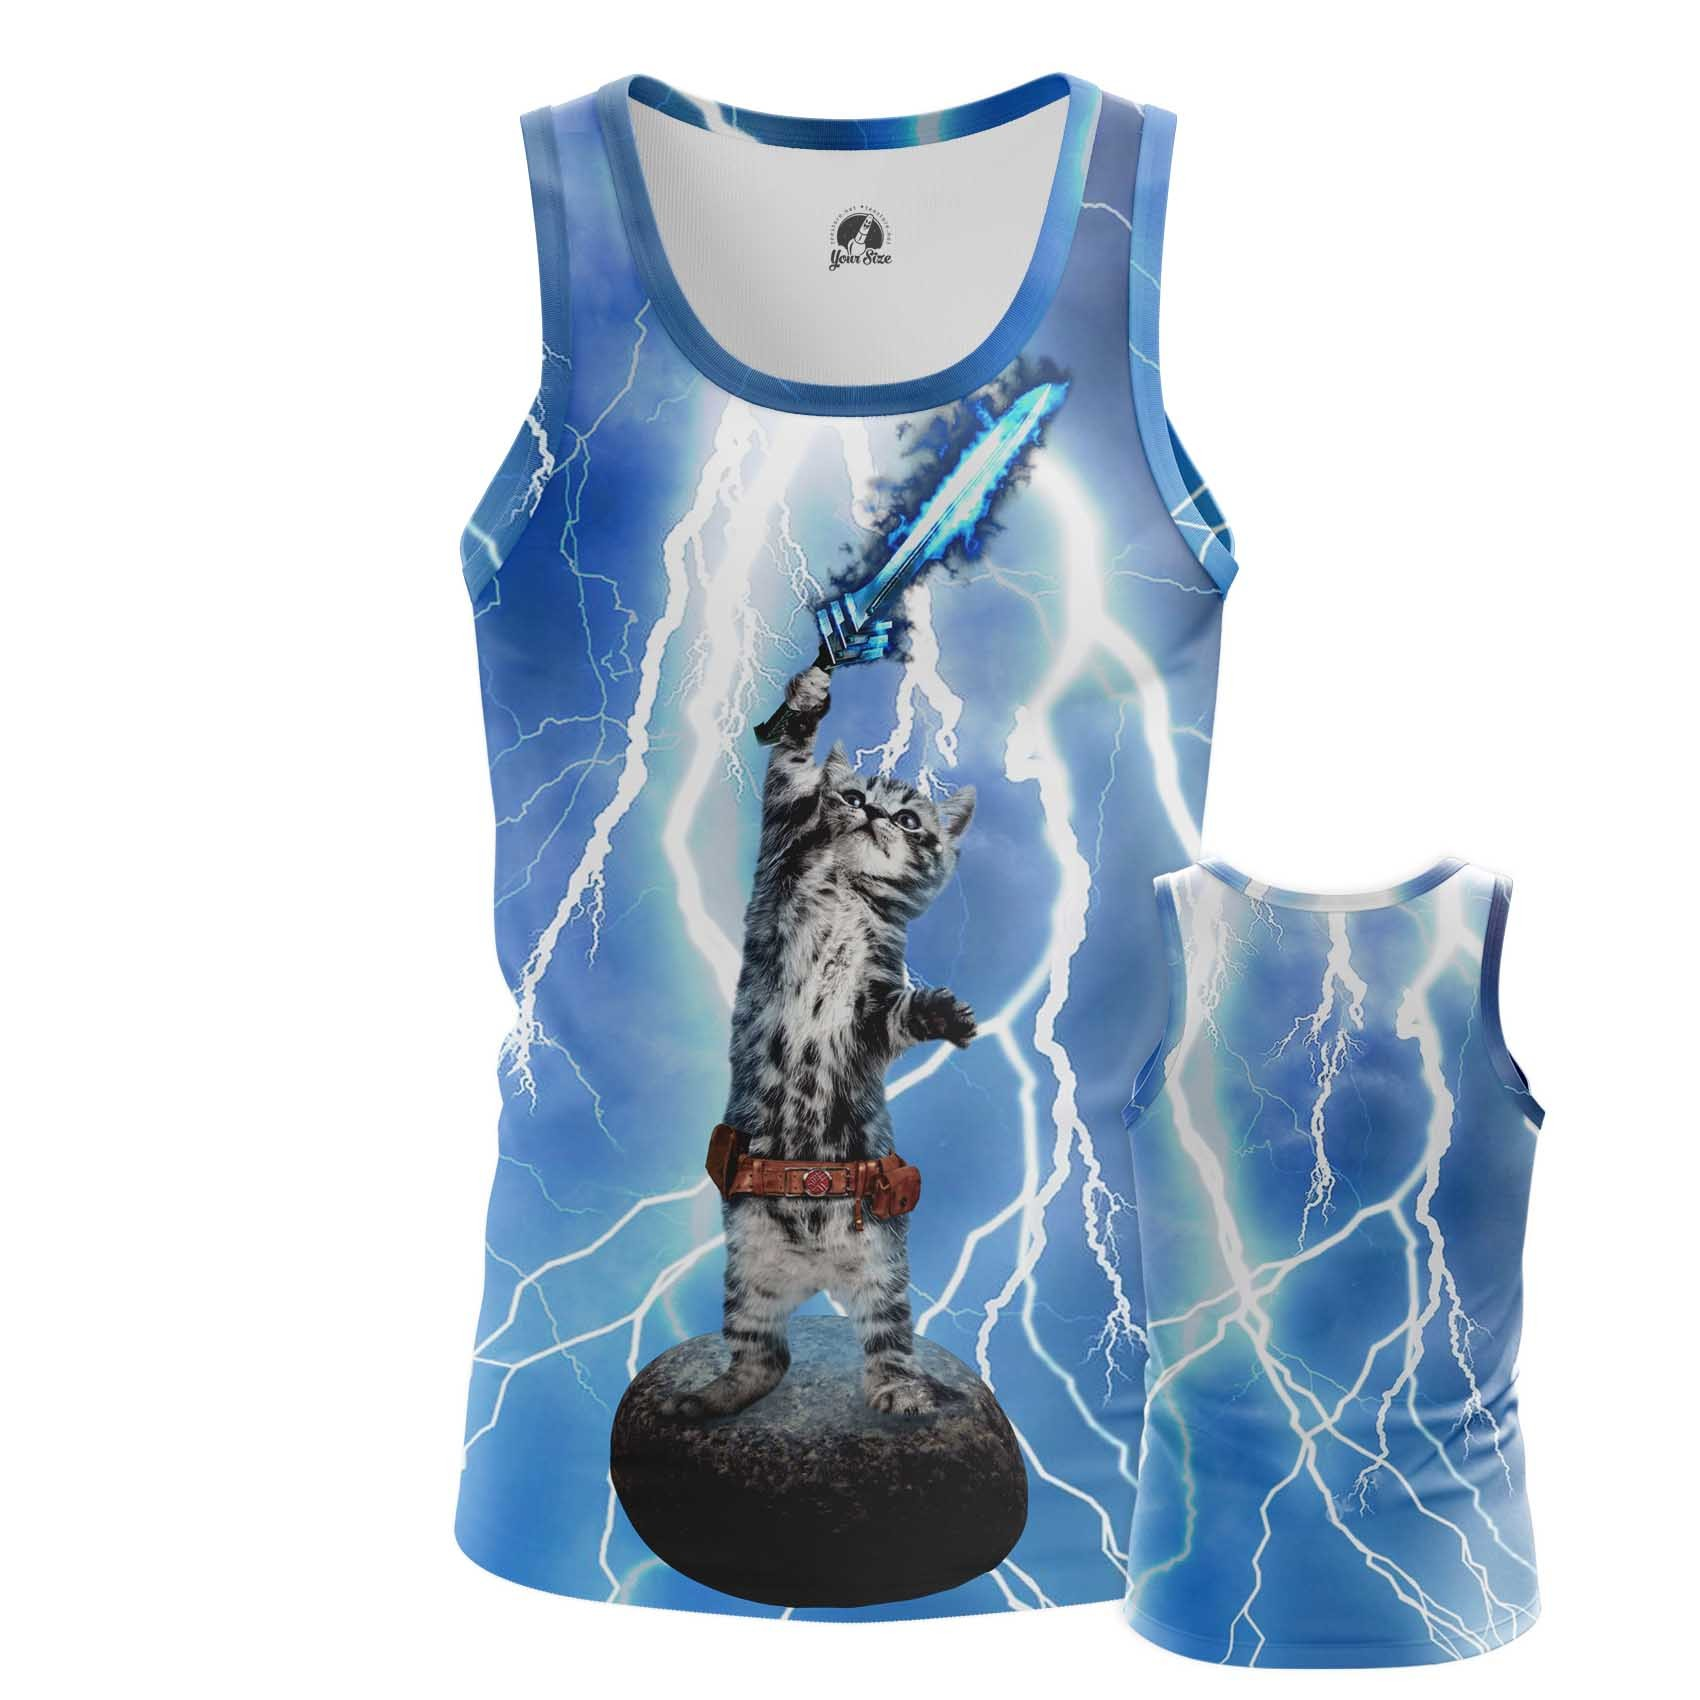 Collectibles Men'S T-Shirt Cat God Internet Cats Thunder Fun